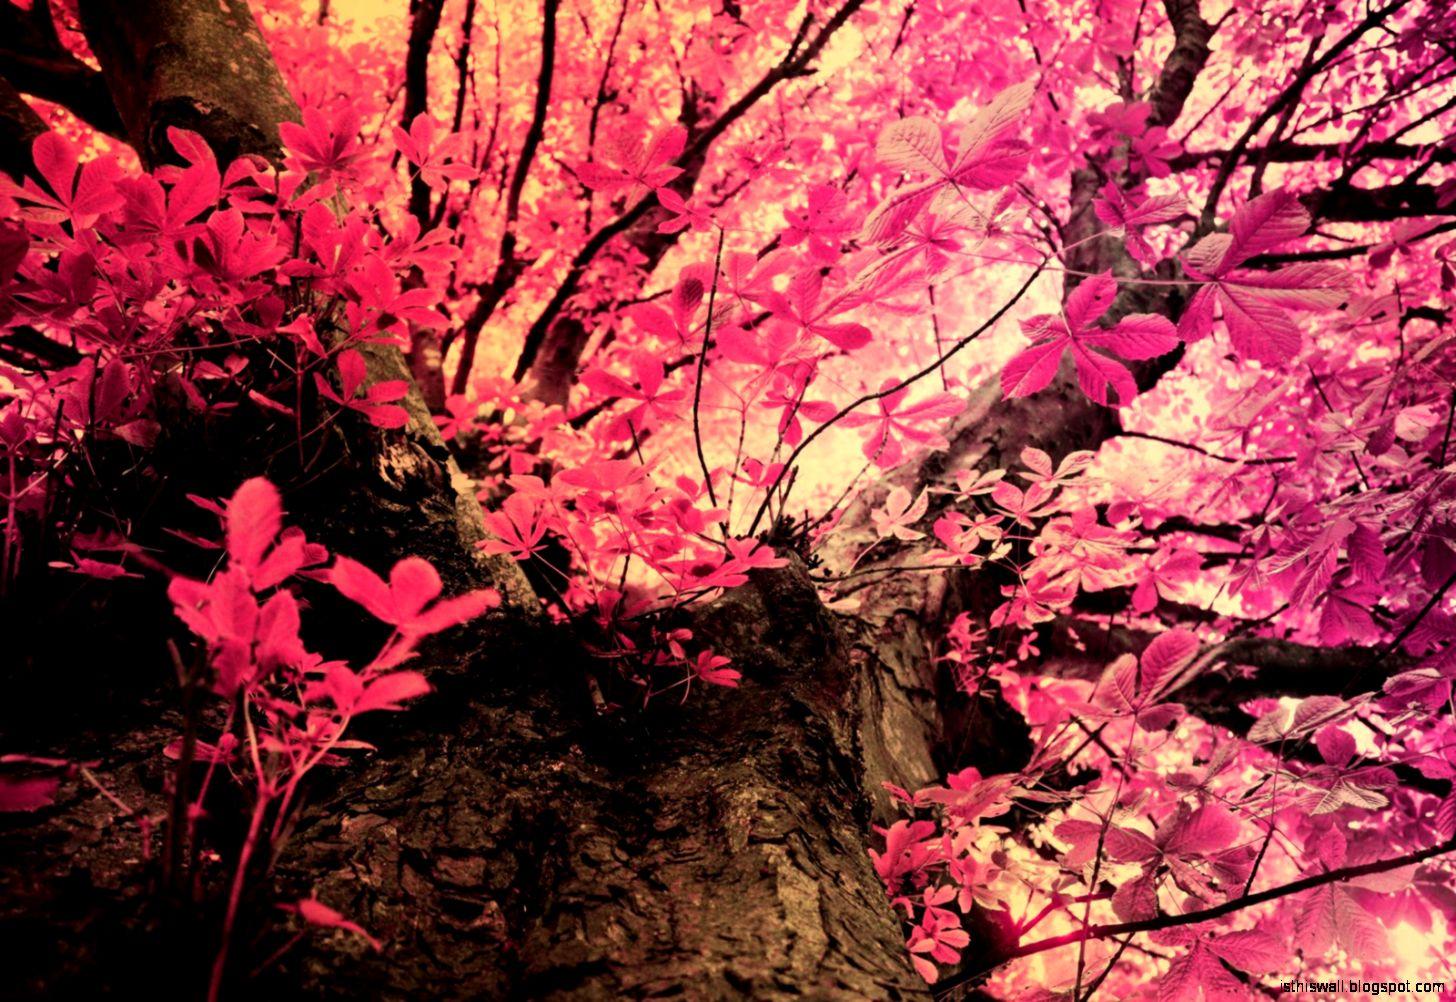 Pink camo wallpaper this wallpapers - Pink camo iphone wallpaper ...